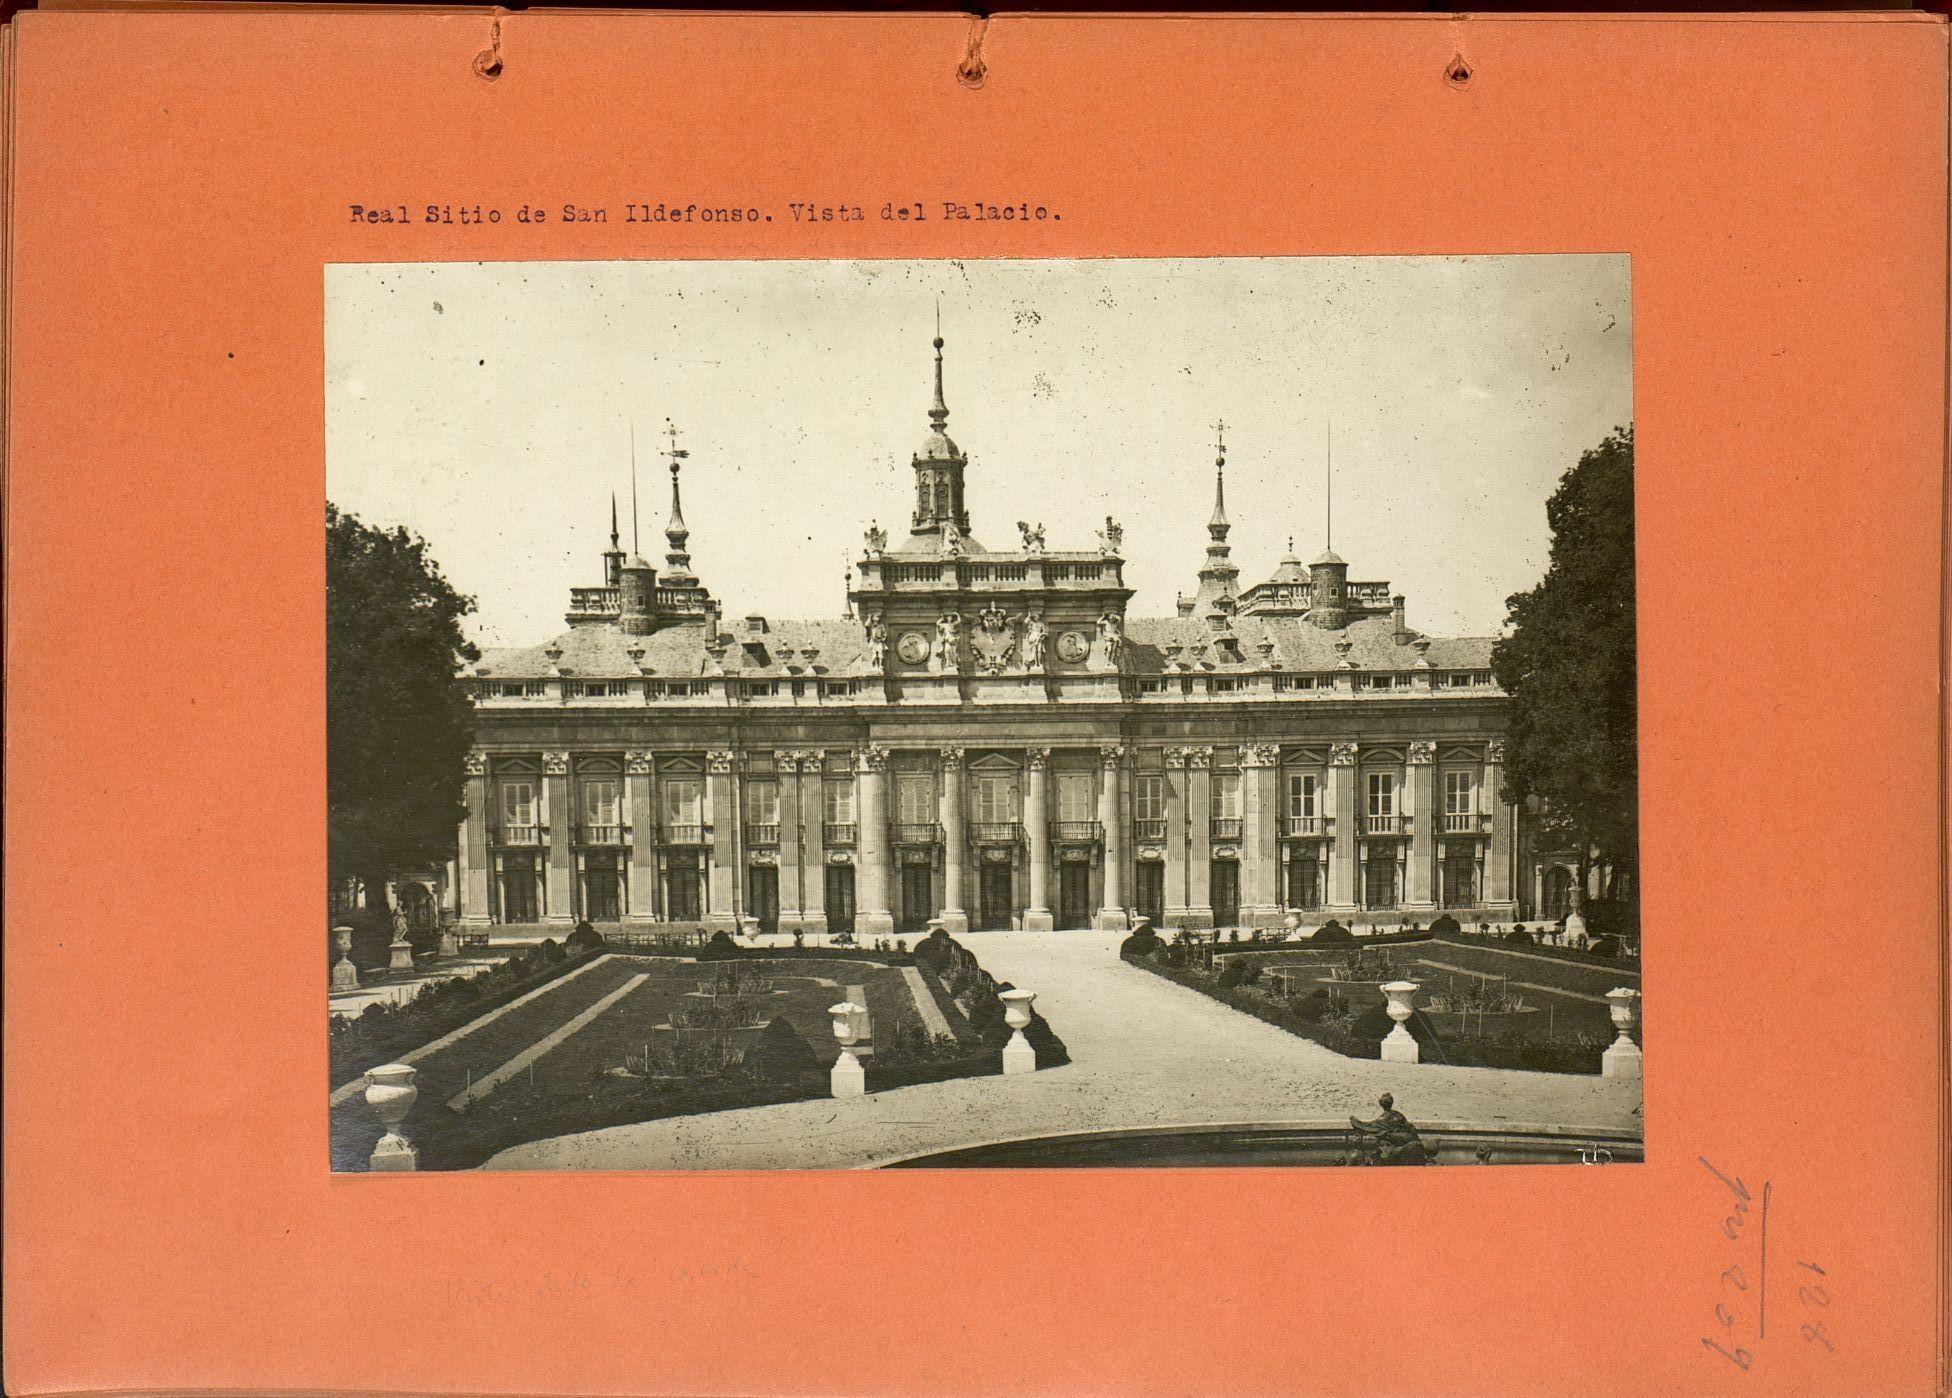 Catálogo monumental de la provincia de Segovia [Manuscrito] / [por Francisco Rodríguez Marín].  T. 3: Láminas. -- p. 112-183 h. en cart. col. naraja de fot. con pie de foto informativo mecan http://aleph.csic.es/F?func=find-c&ccl_term=SYS%3D001359509&local_base=MAD01